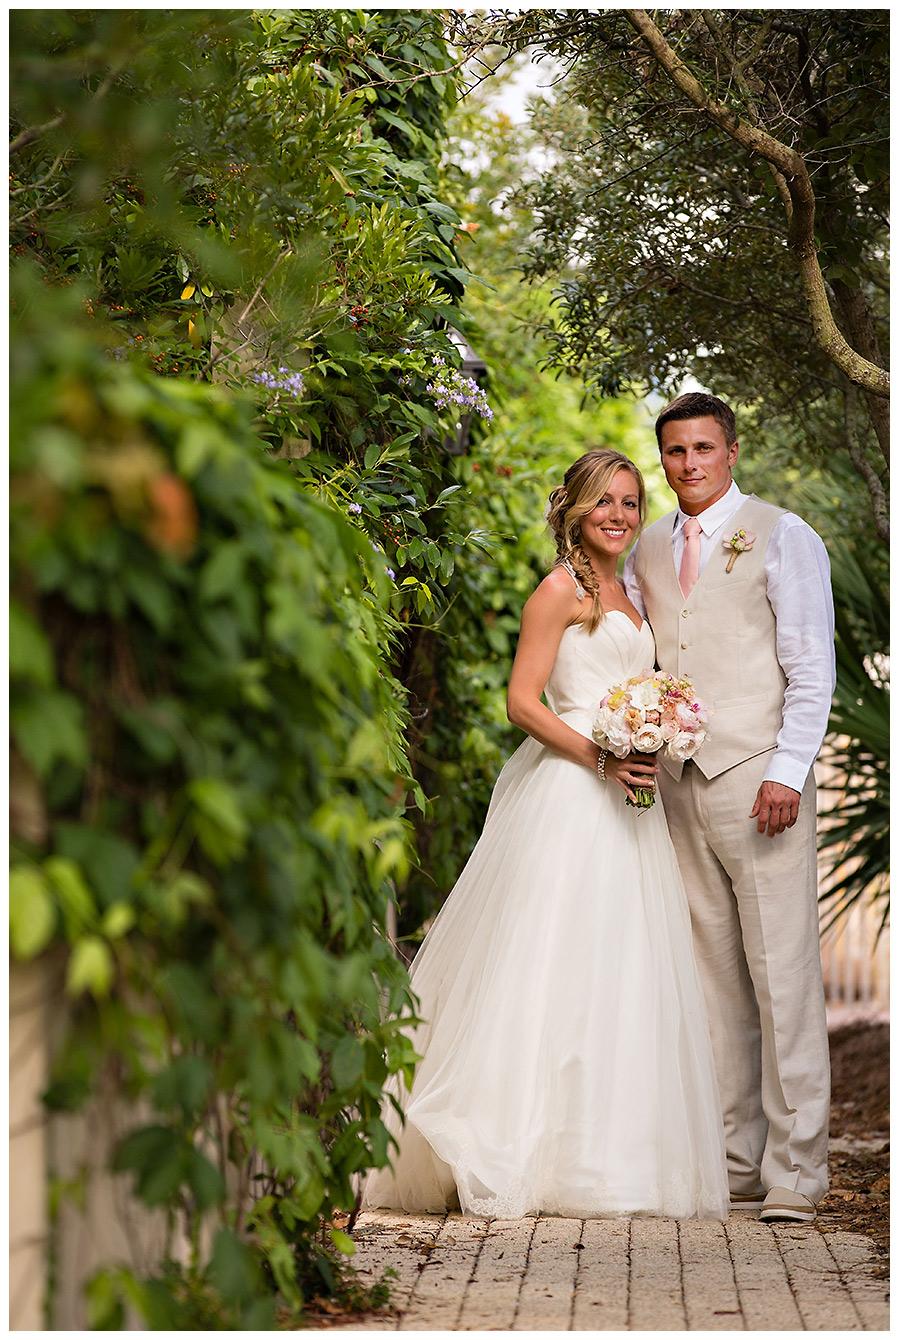 Candice berryman wedding